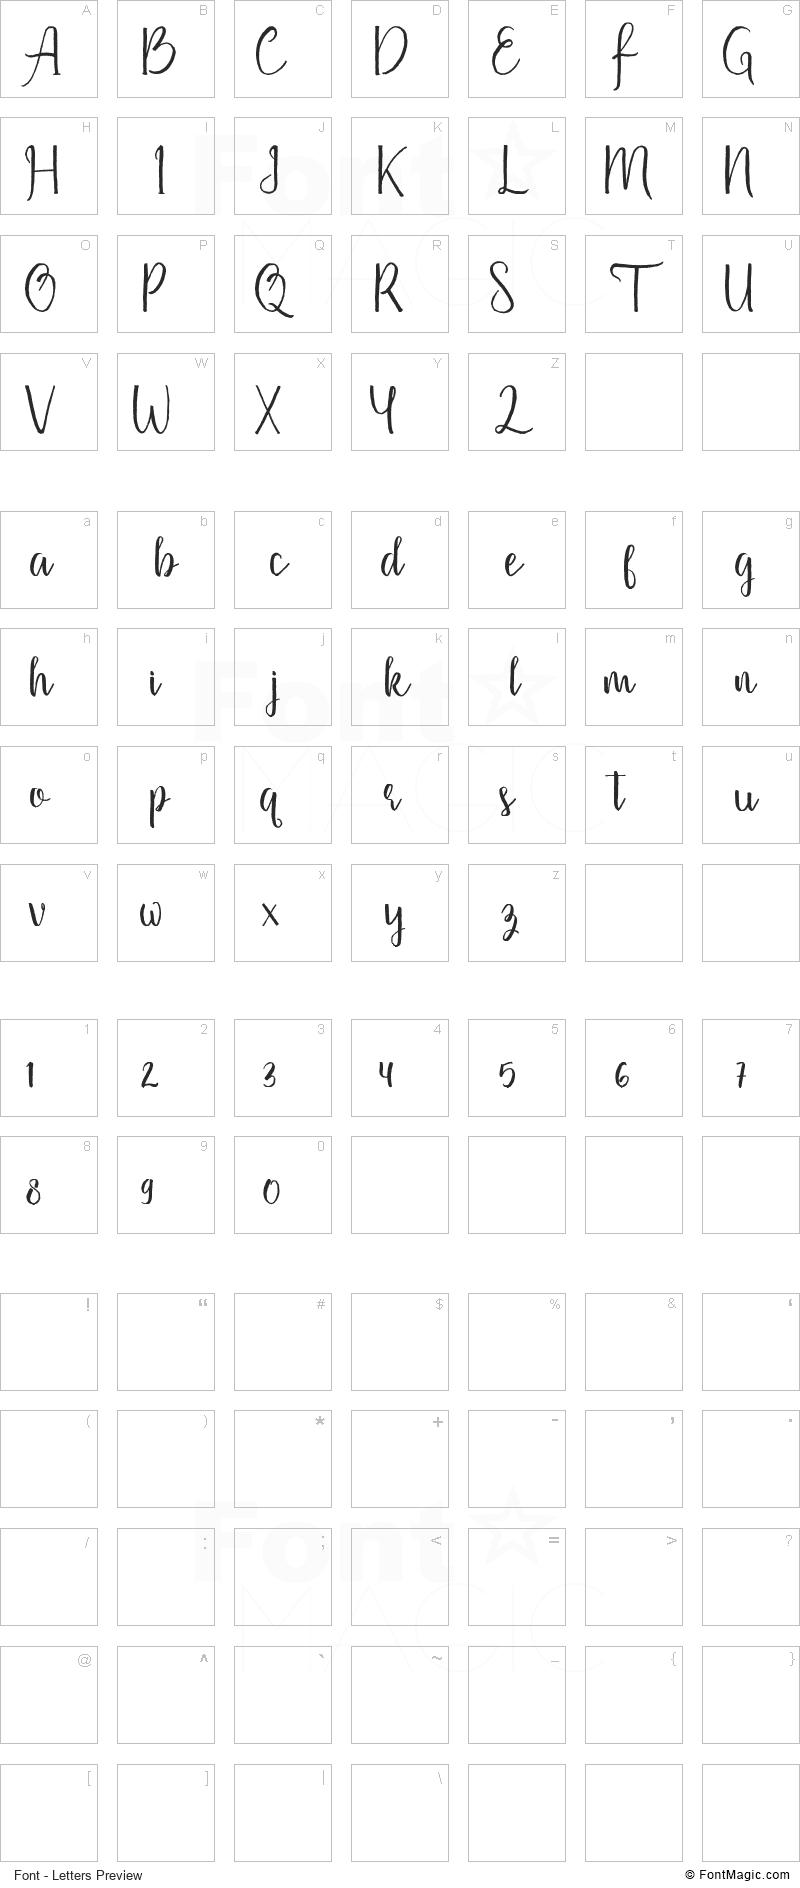 Firdaus Font - All Latters Preview Chart